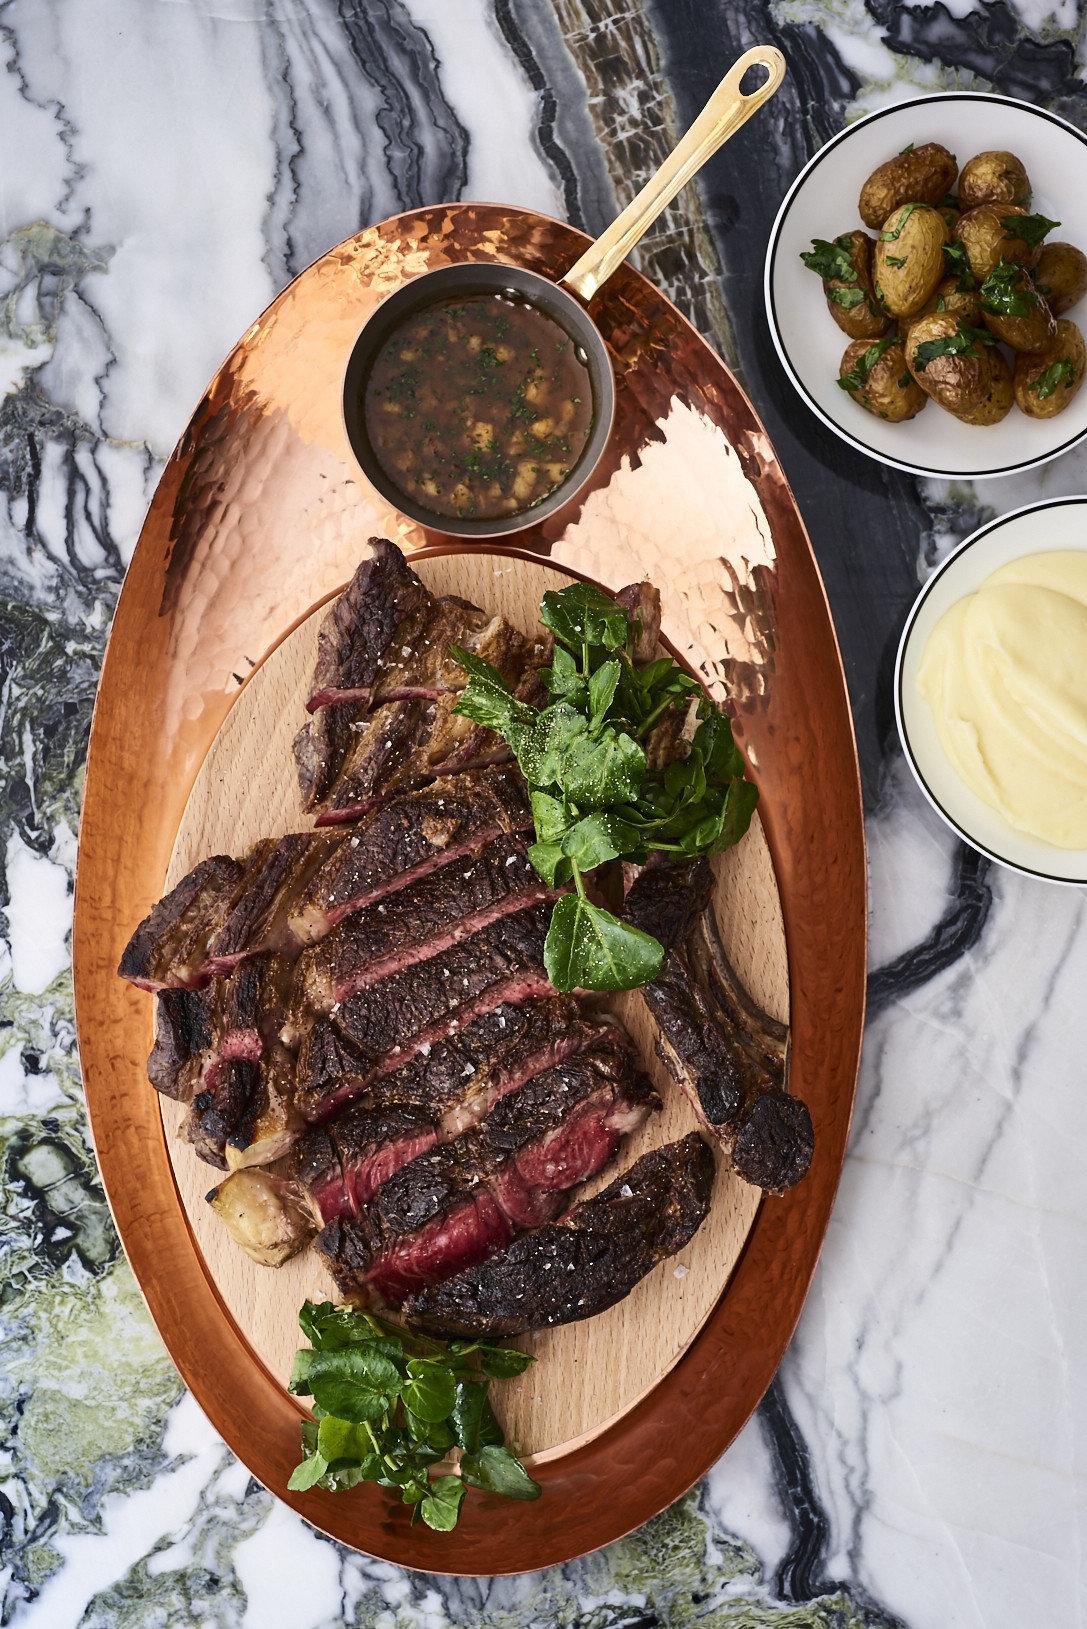 Food + Drink France Jetsetter Guides Paris food plate meat dish grilling meal roasting produce cuisine restaurant